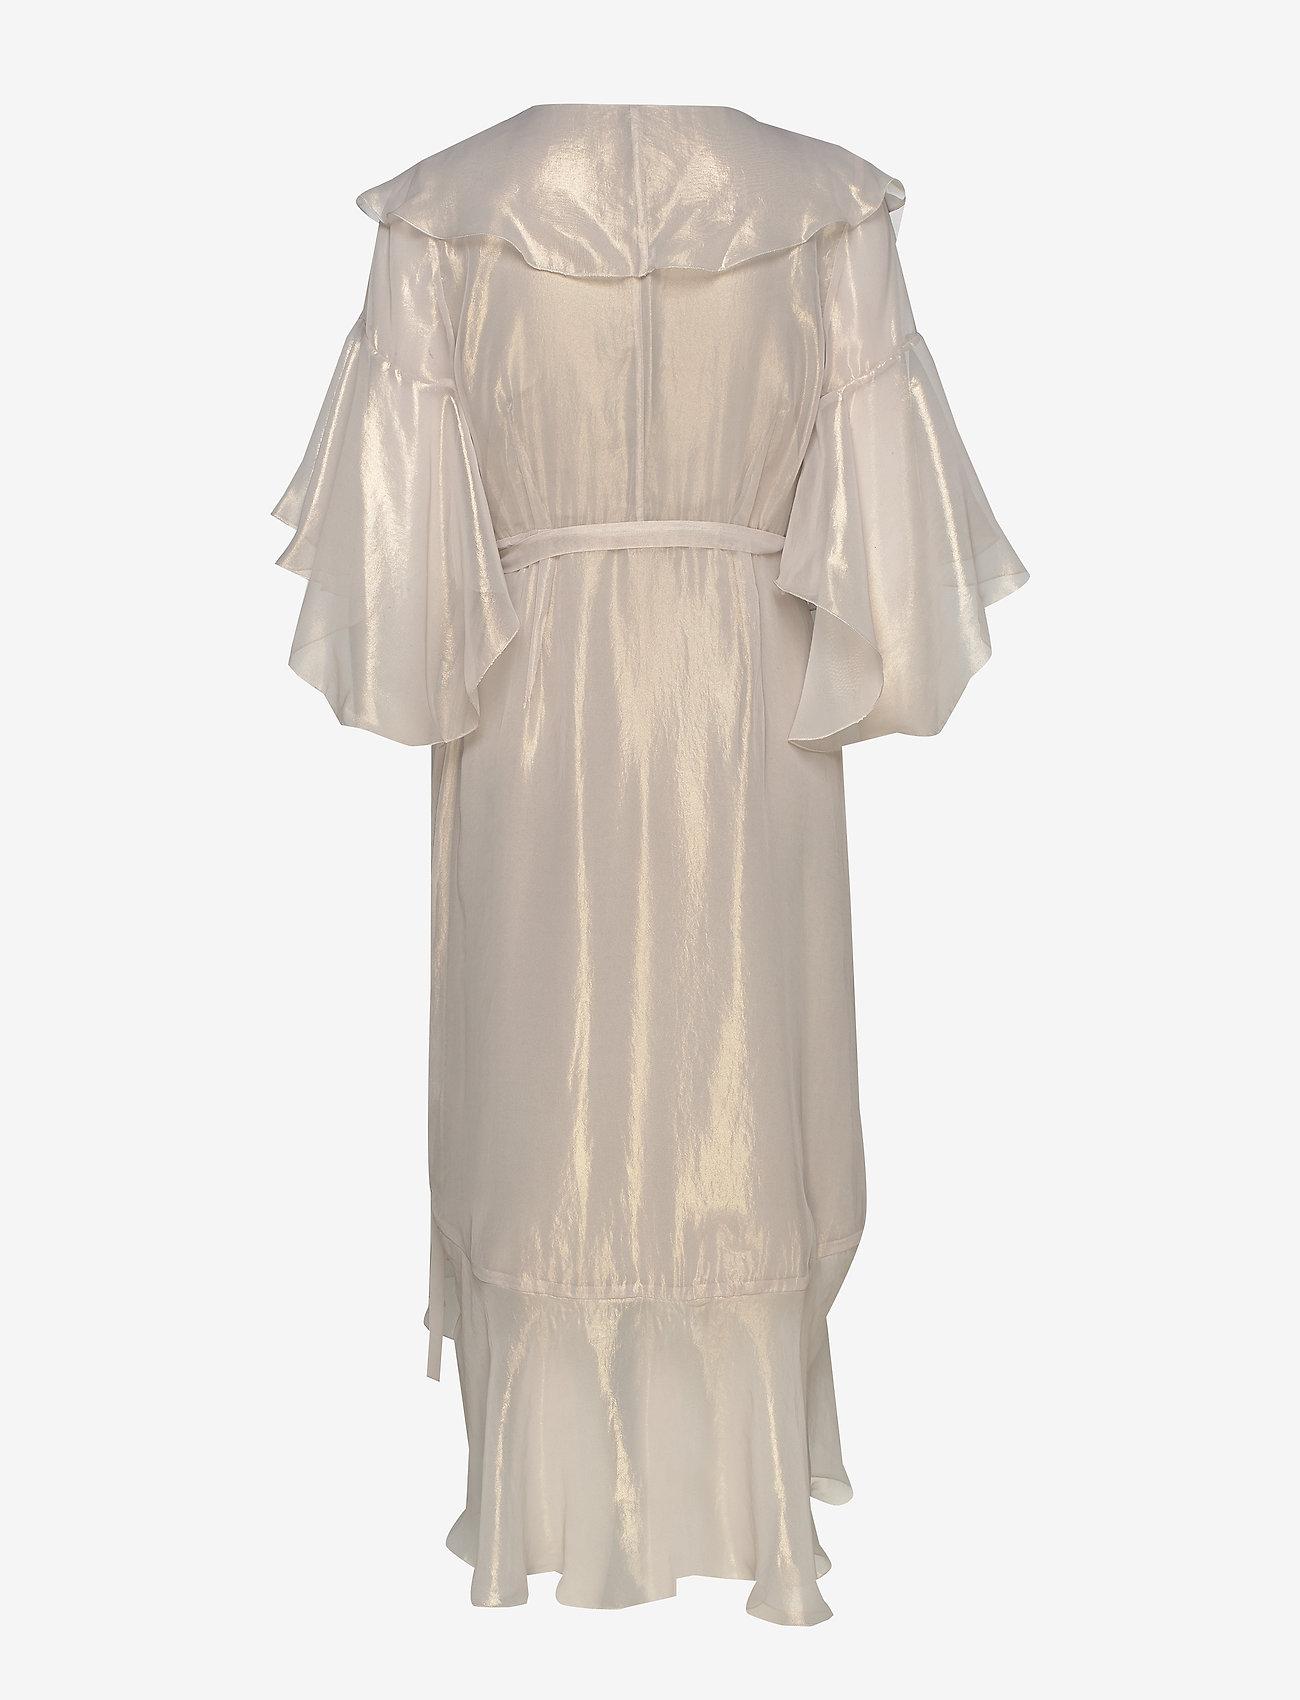 Klassisk Online Butik Kvinder Tøj.Petronella Frill Dress Gold 1279.50 hálo NK63Q5 8qsXKl